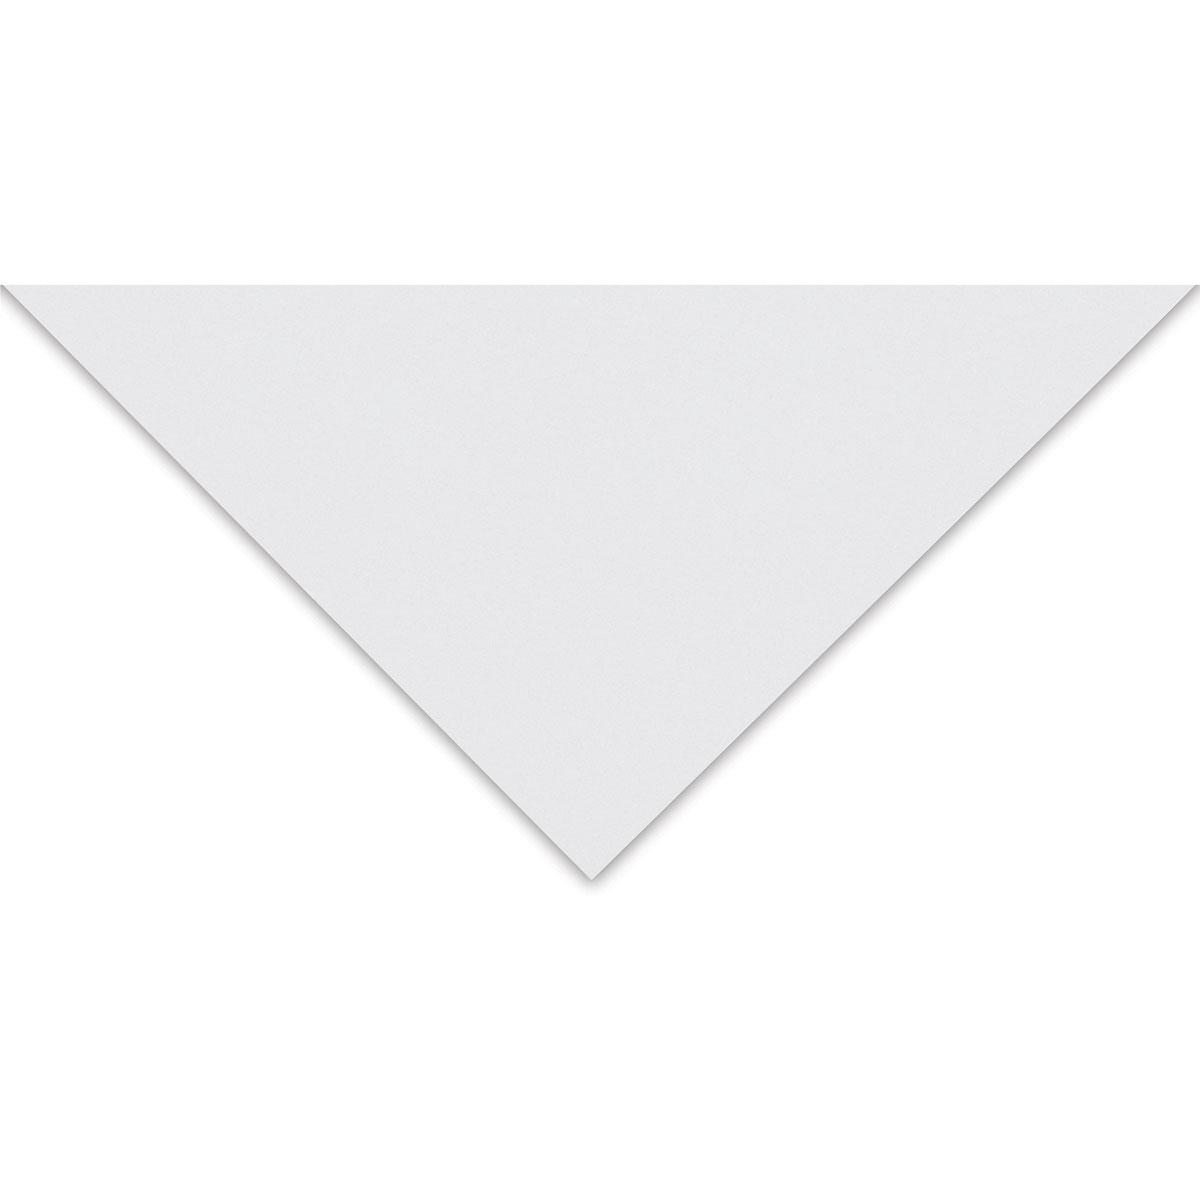 Crescent RagMat Matboard - 20 x 32, White